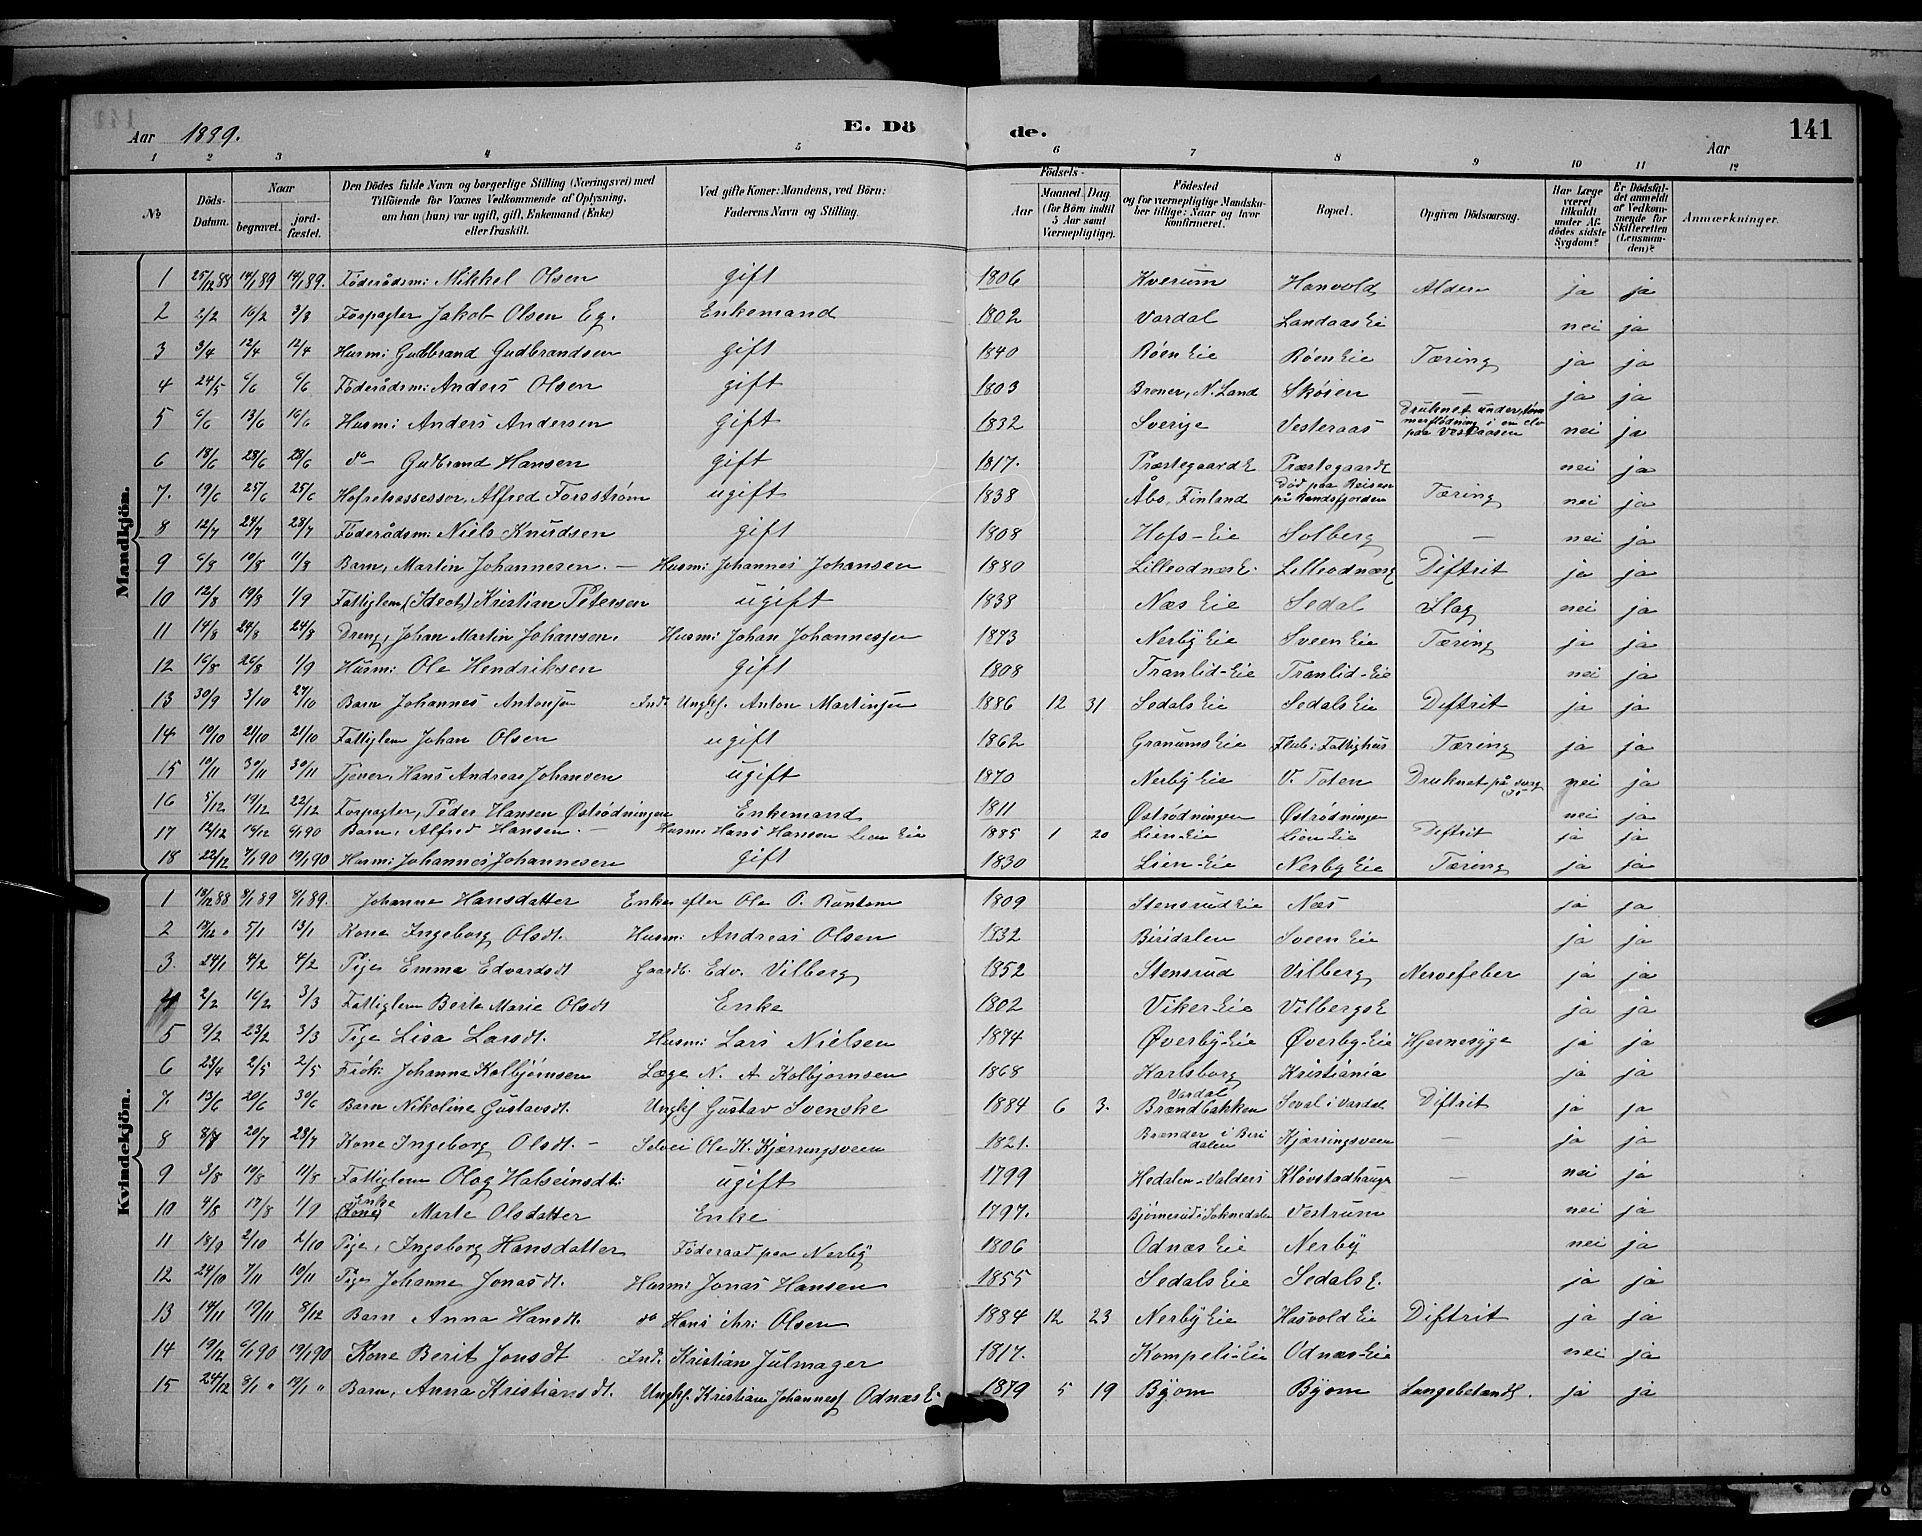 SAH, Søndre Land prestekontor, L/L0003: Klokkerbok nr. 3, 1884-1902, s. 141